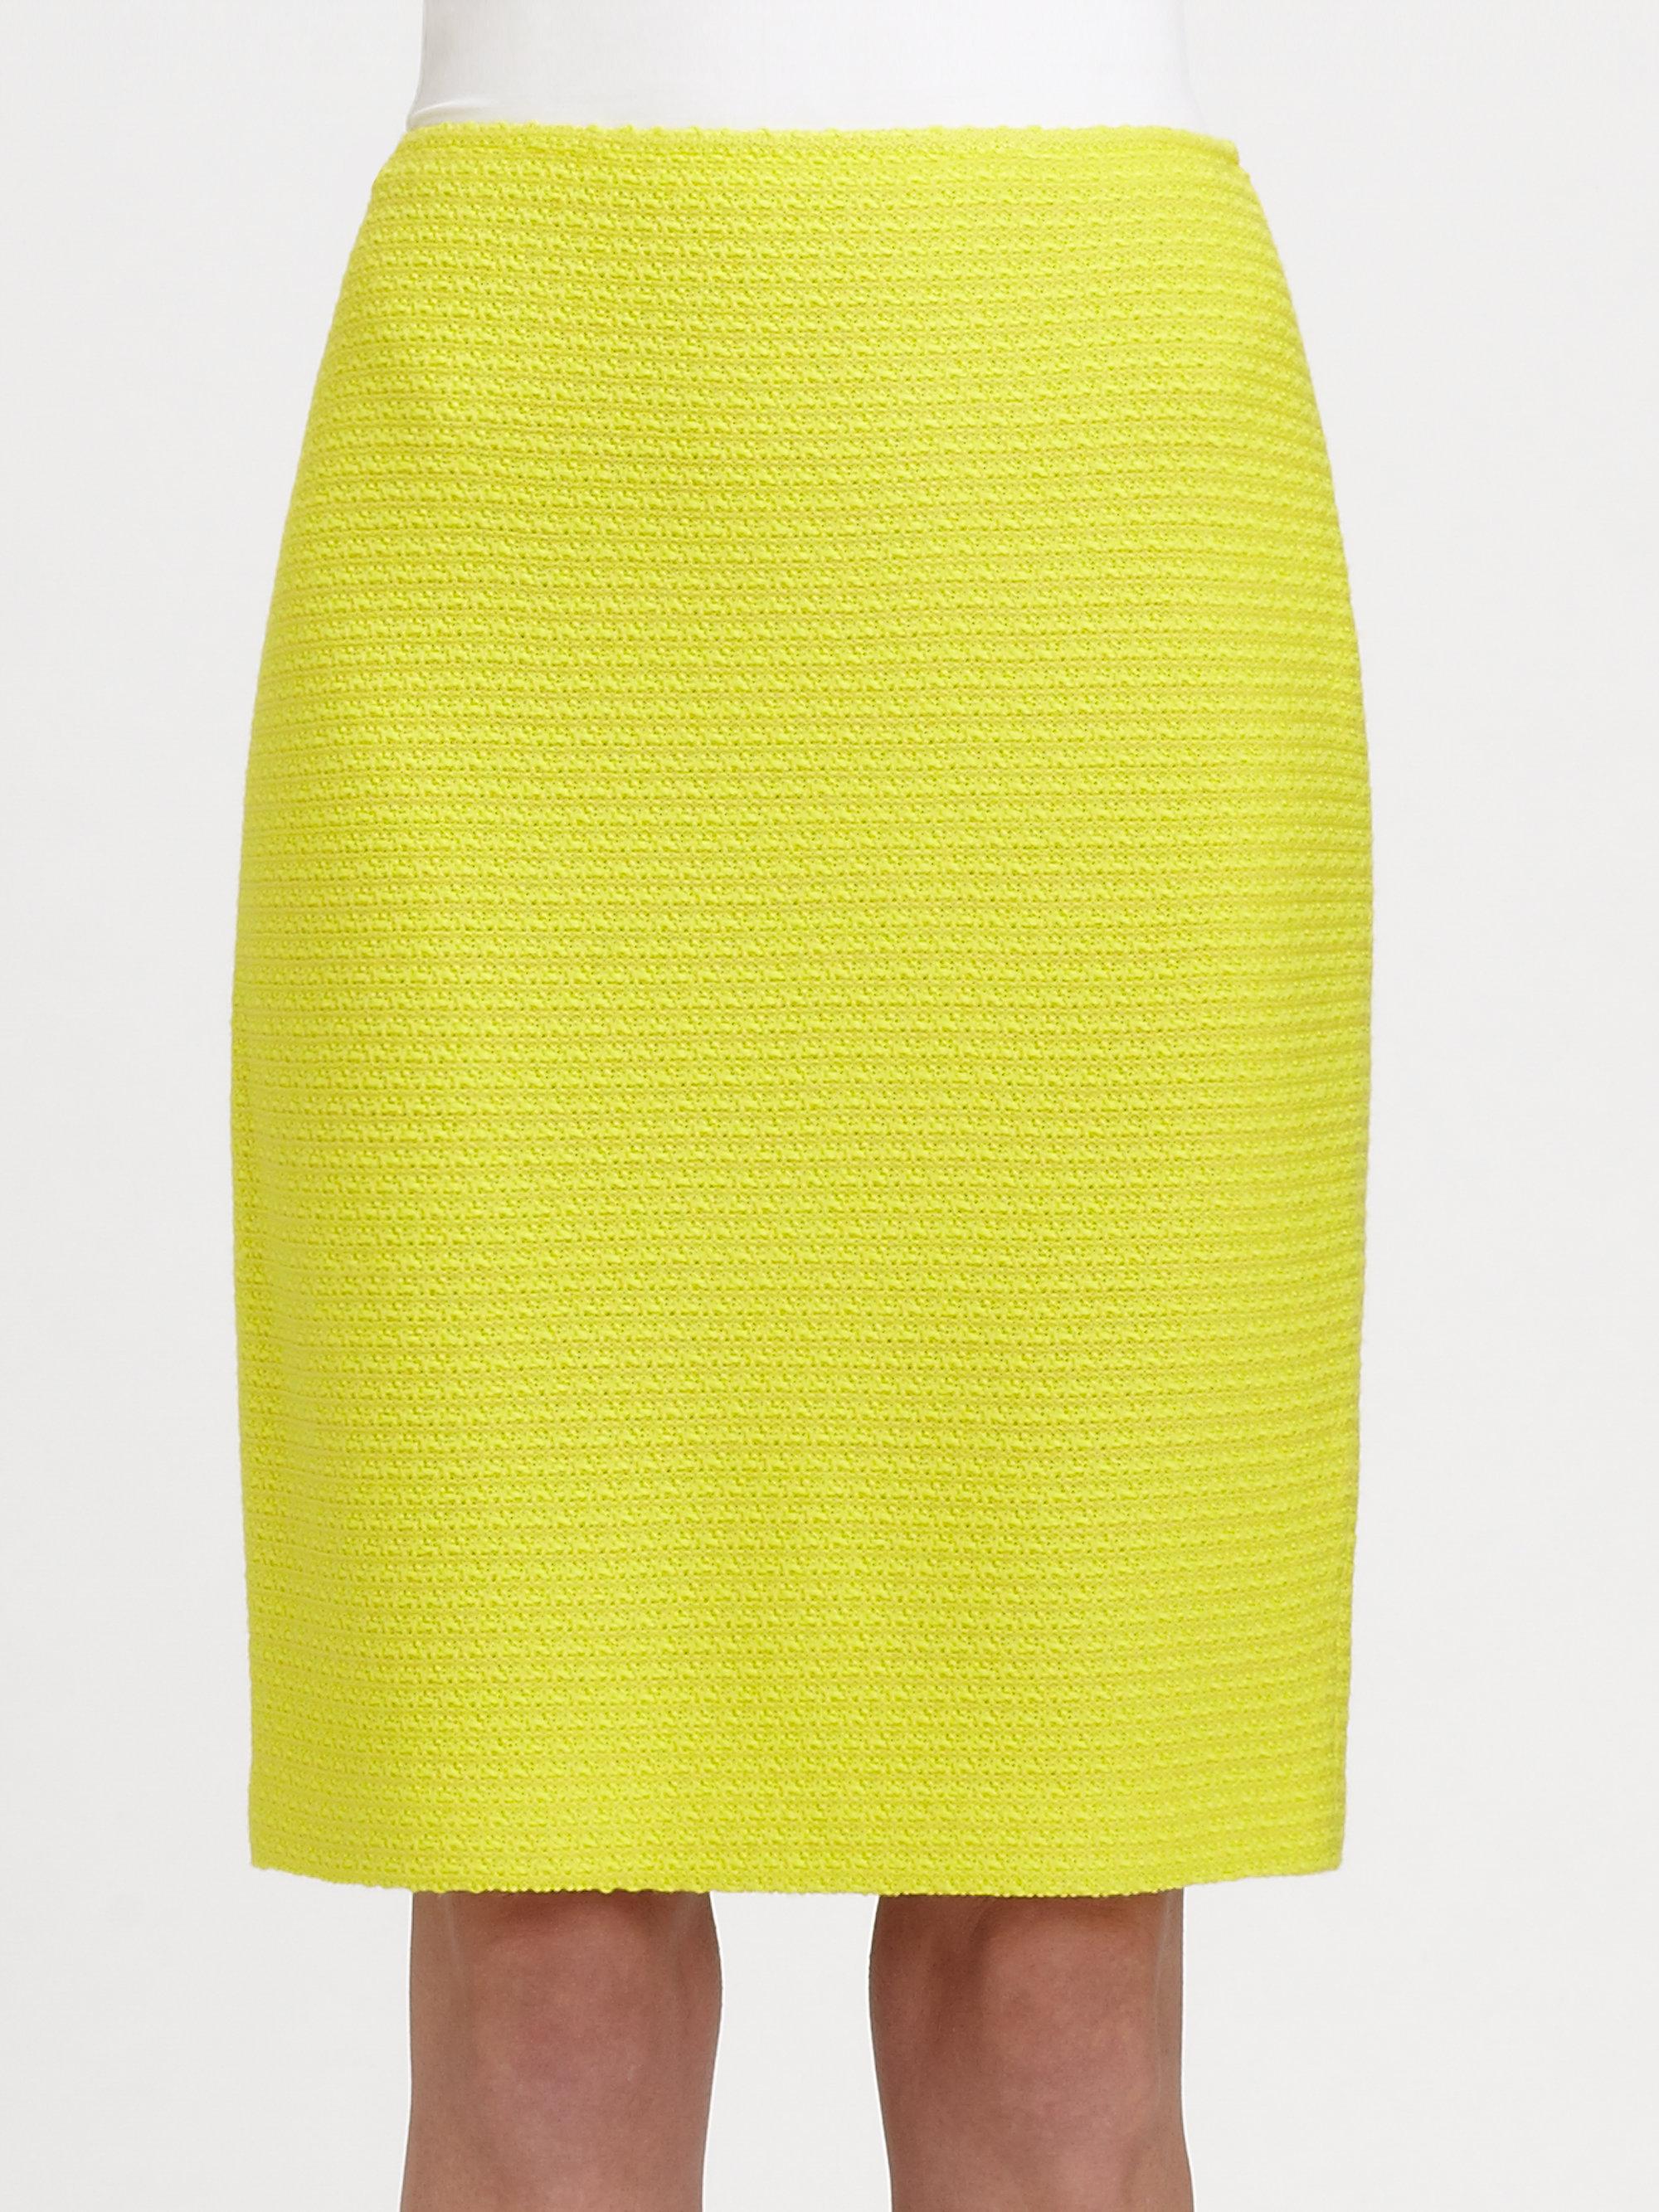 st soho tweed pencil skirt in yellow neon yellow